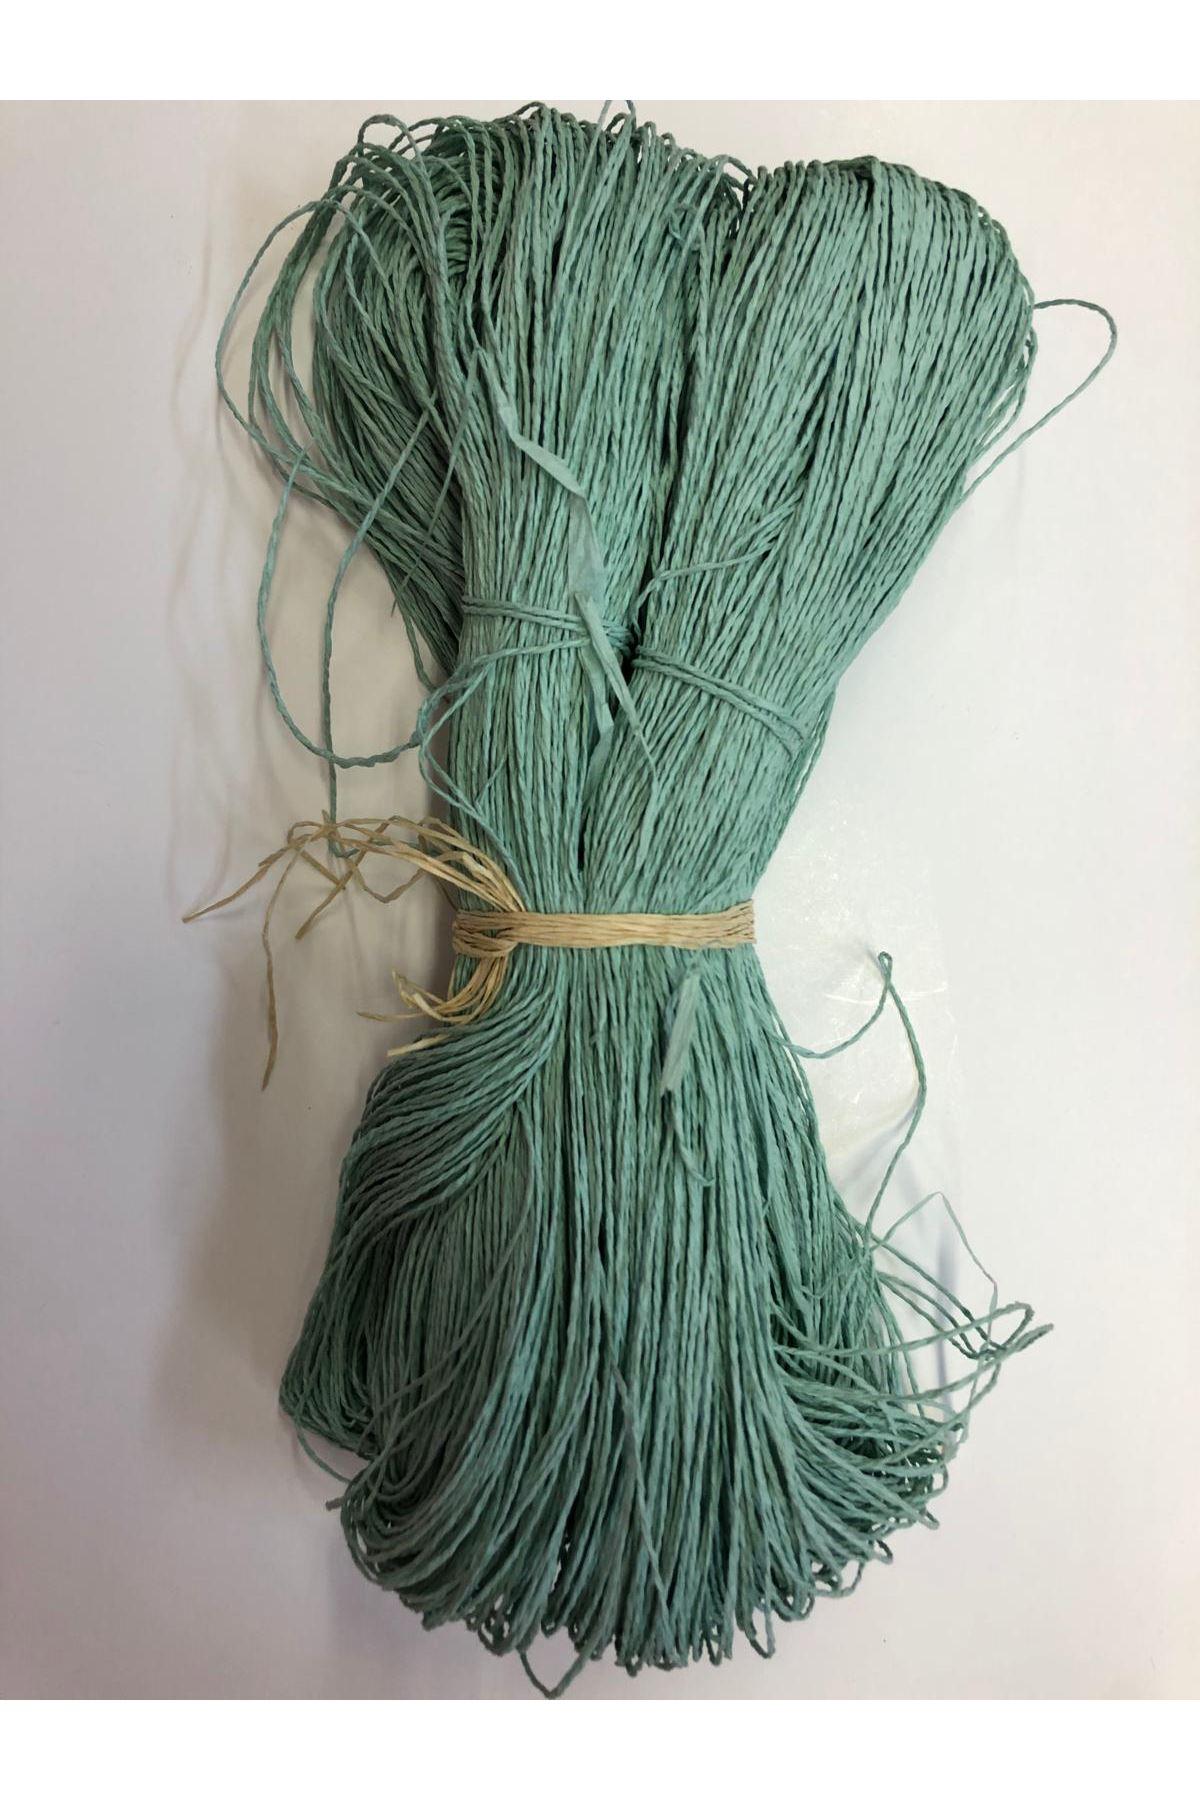 Kağıt İp Çağla Yeşili 536 gram